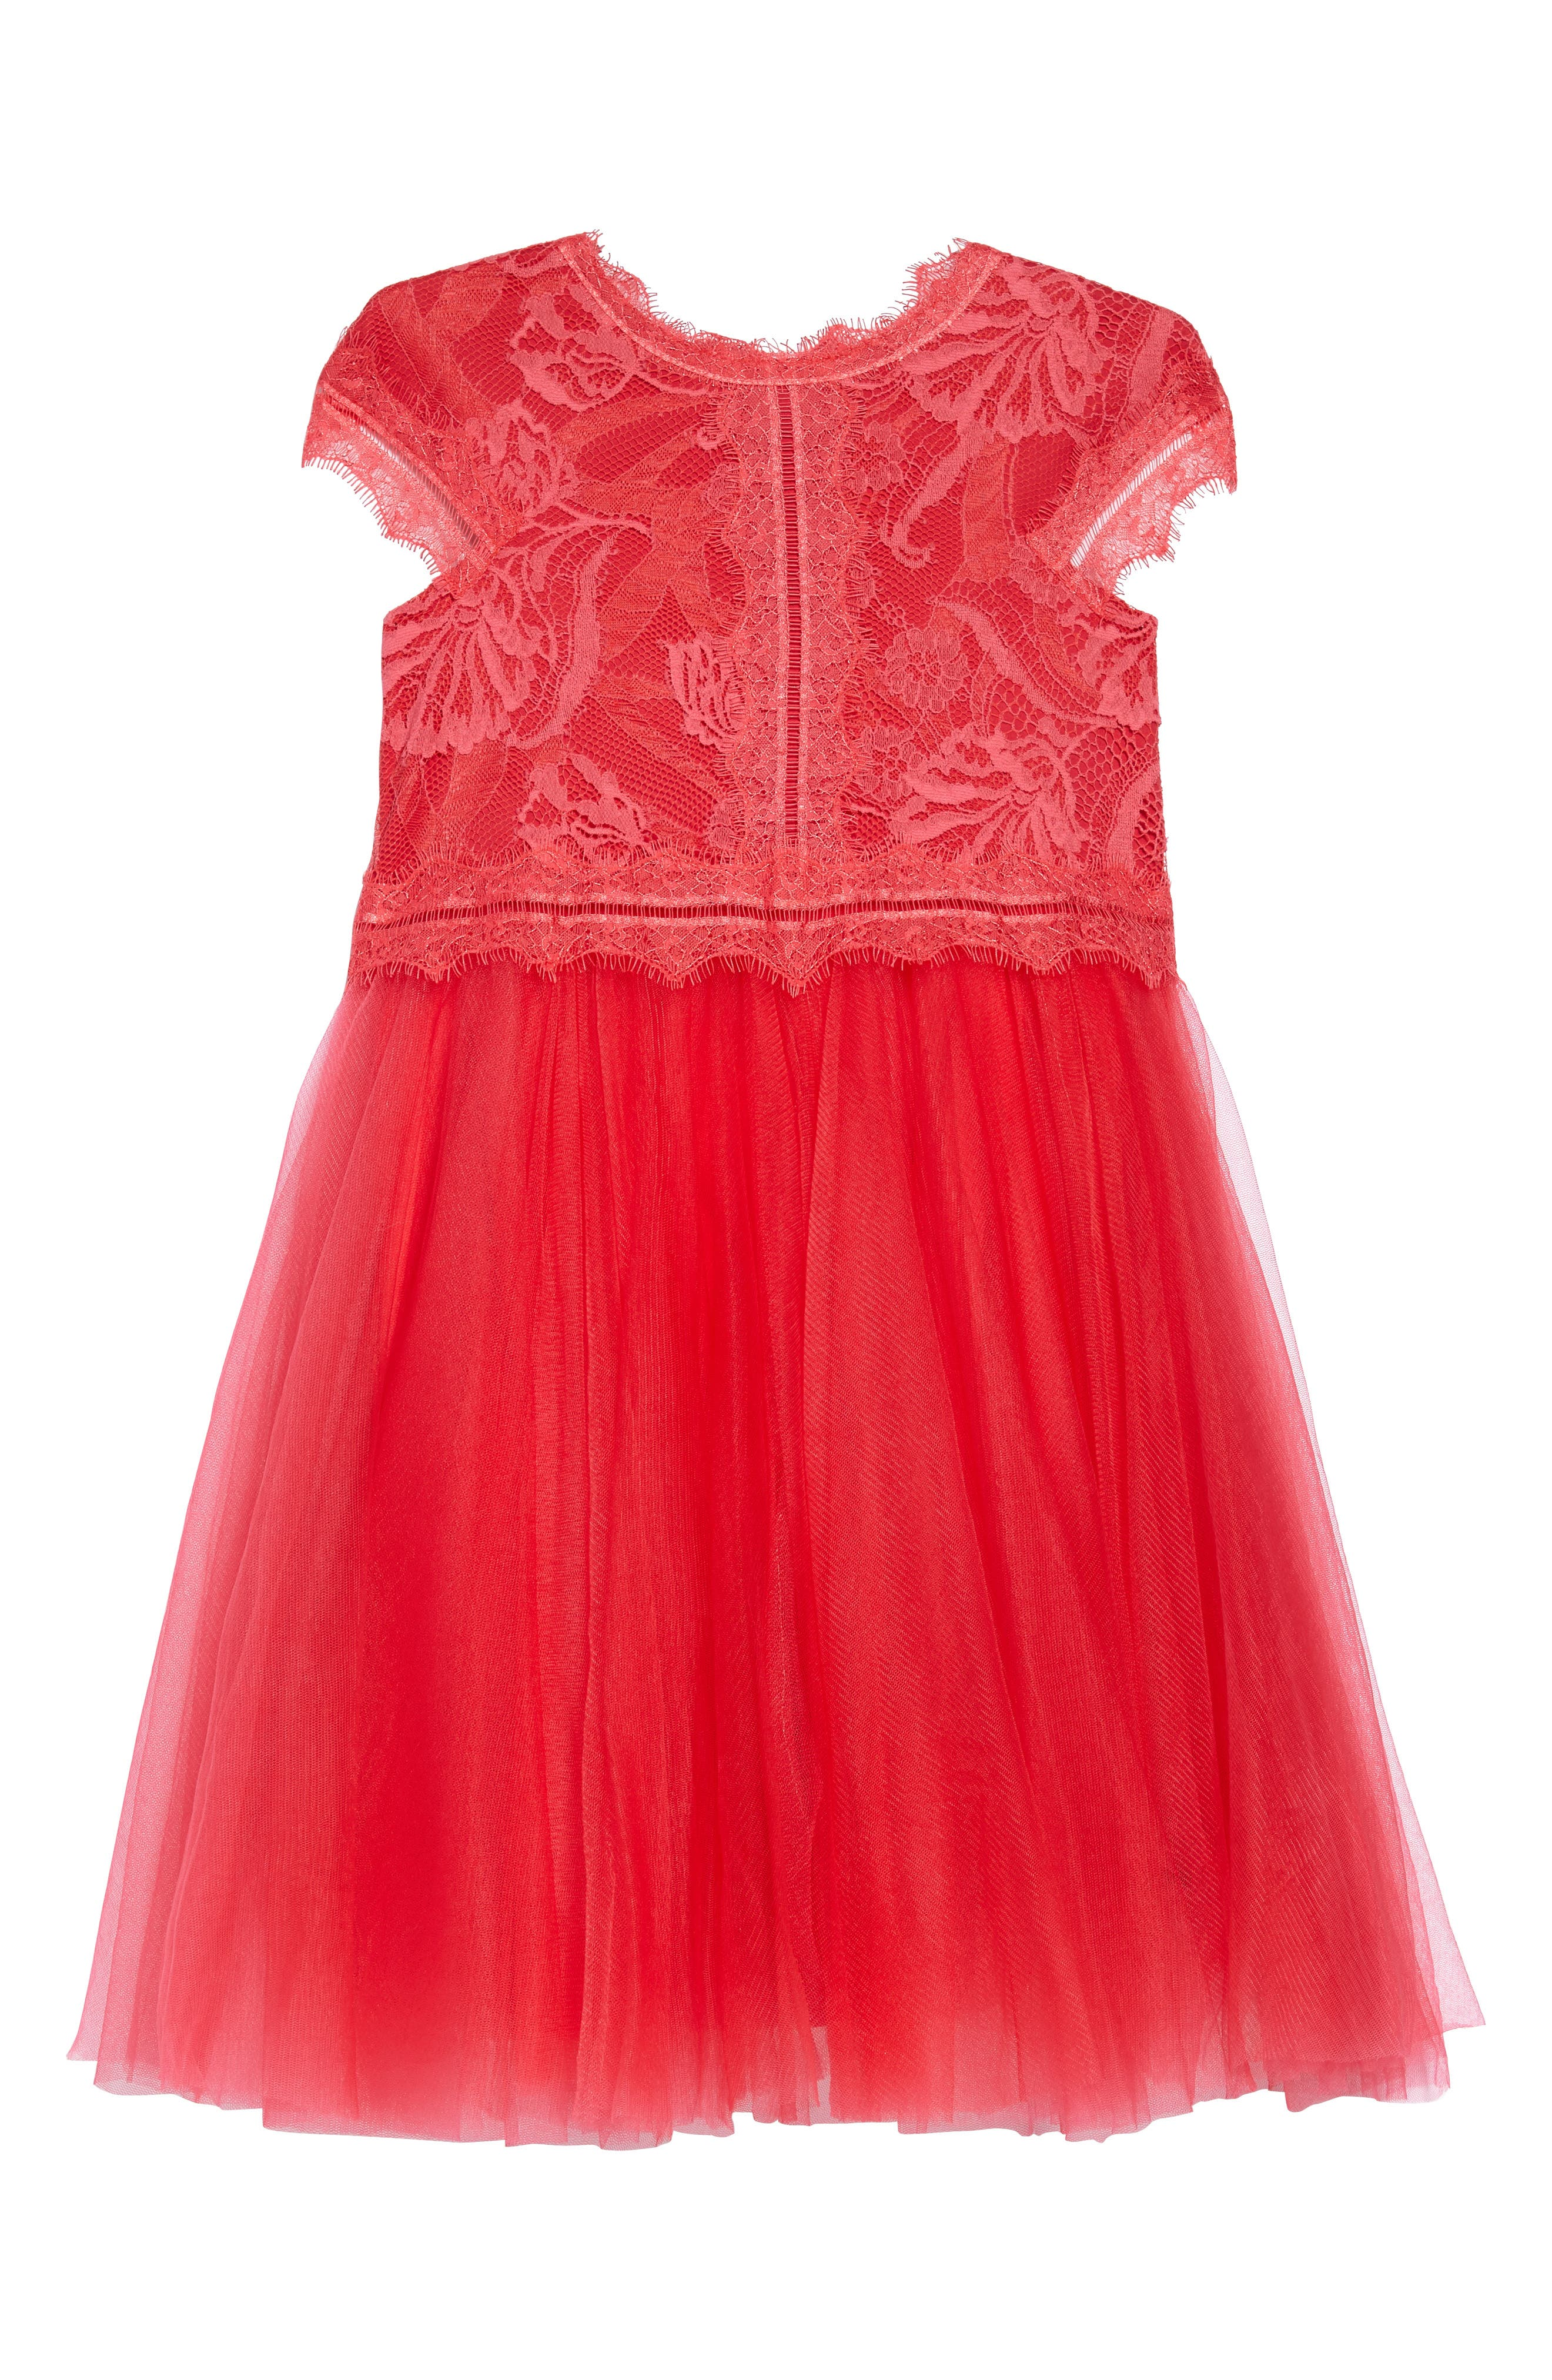 Floral Lace Tulle Dress,                             Main thumbnail 1, color,                             605